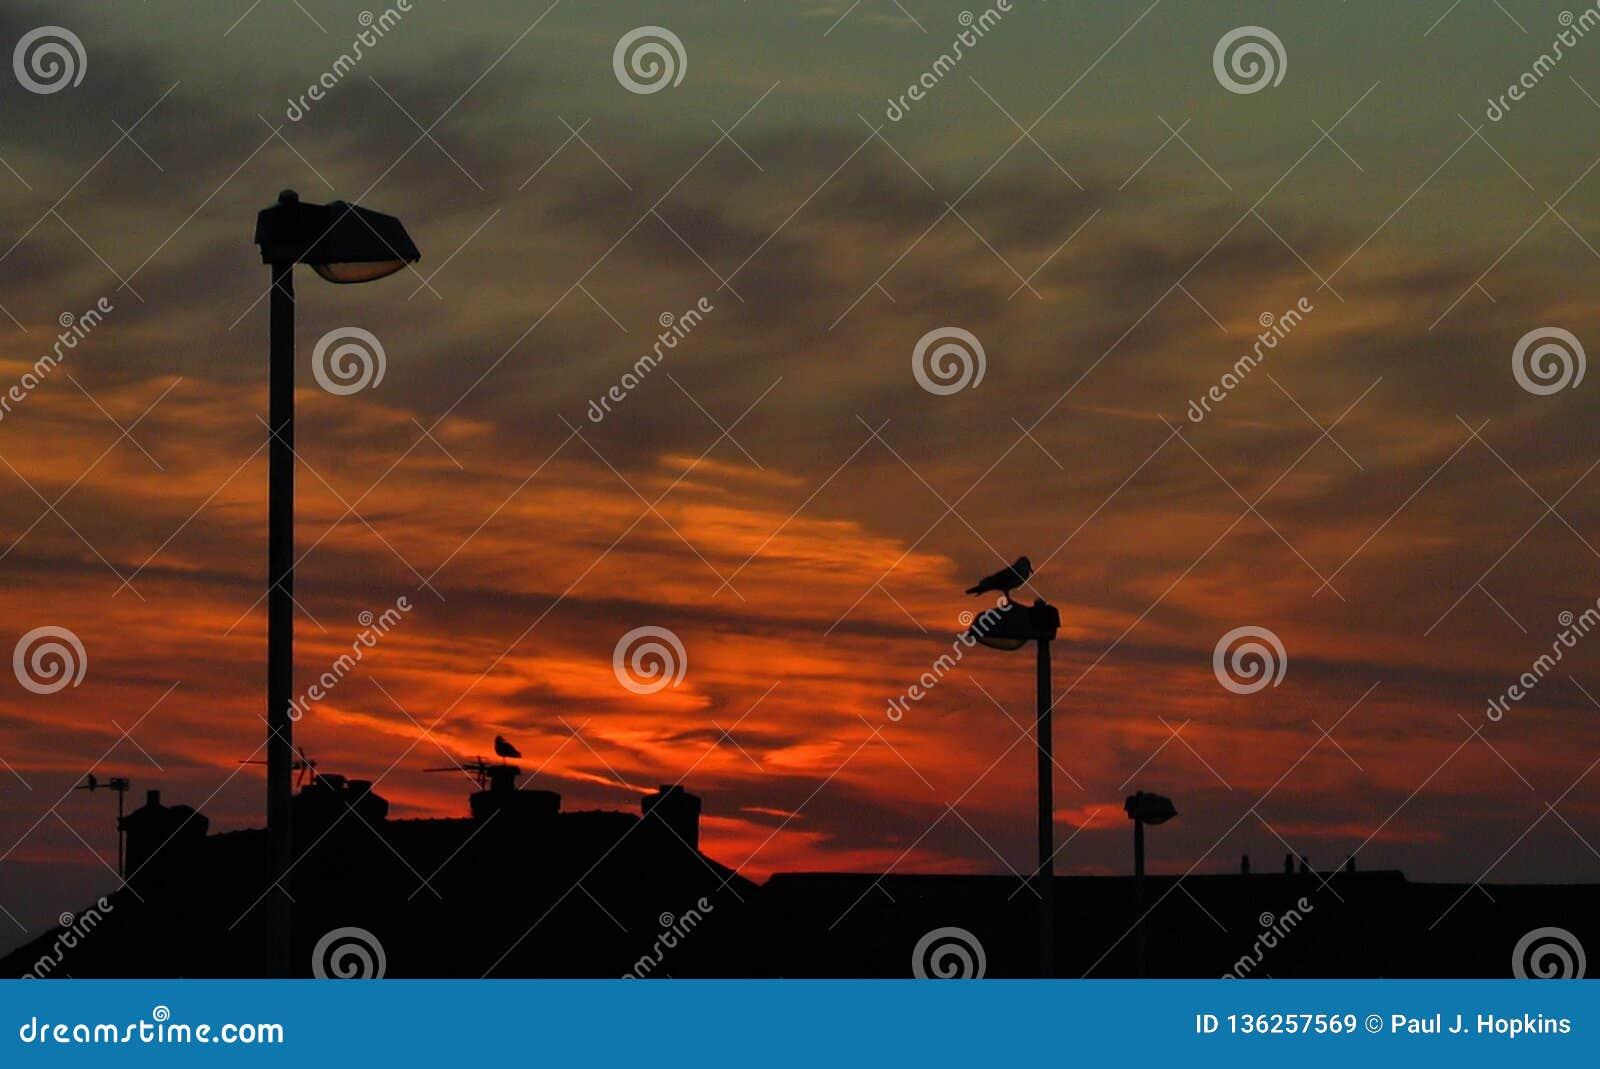 Seagulls Against The Sunrise